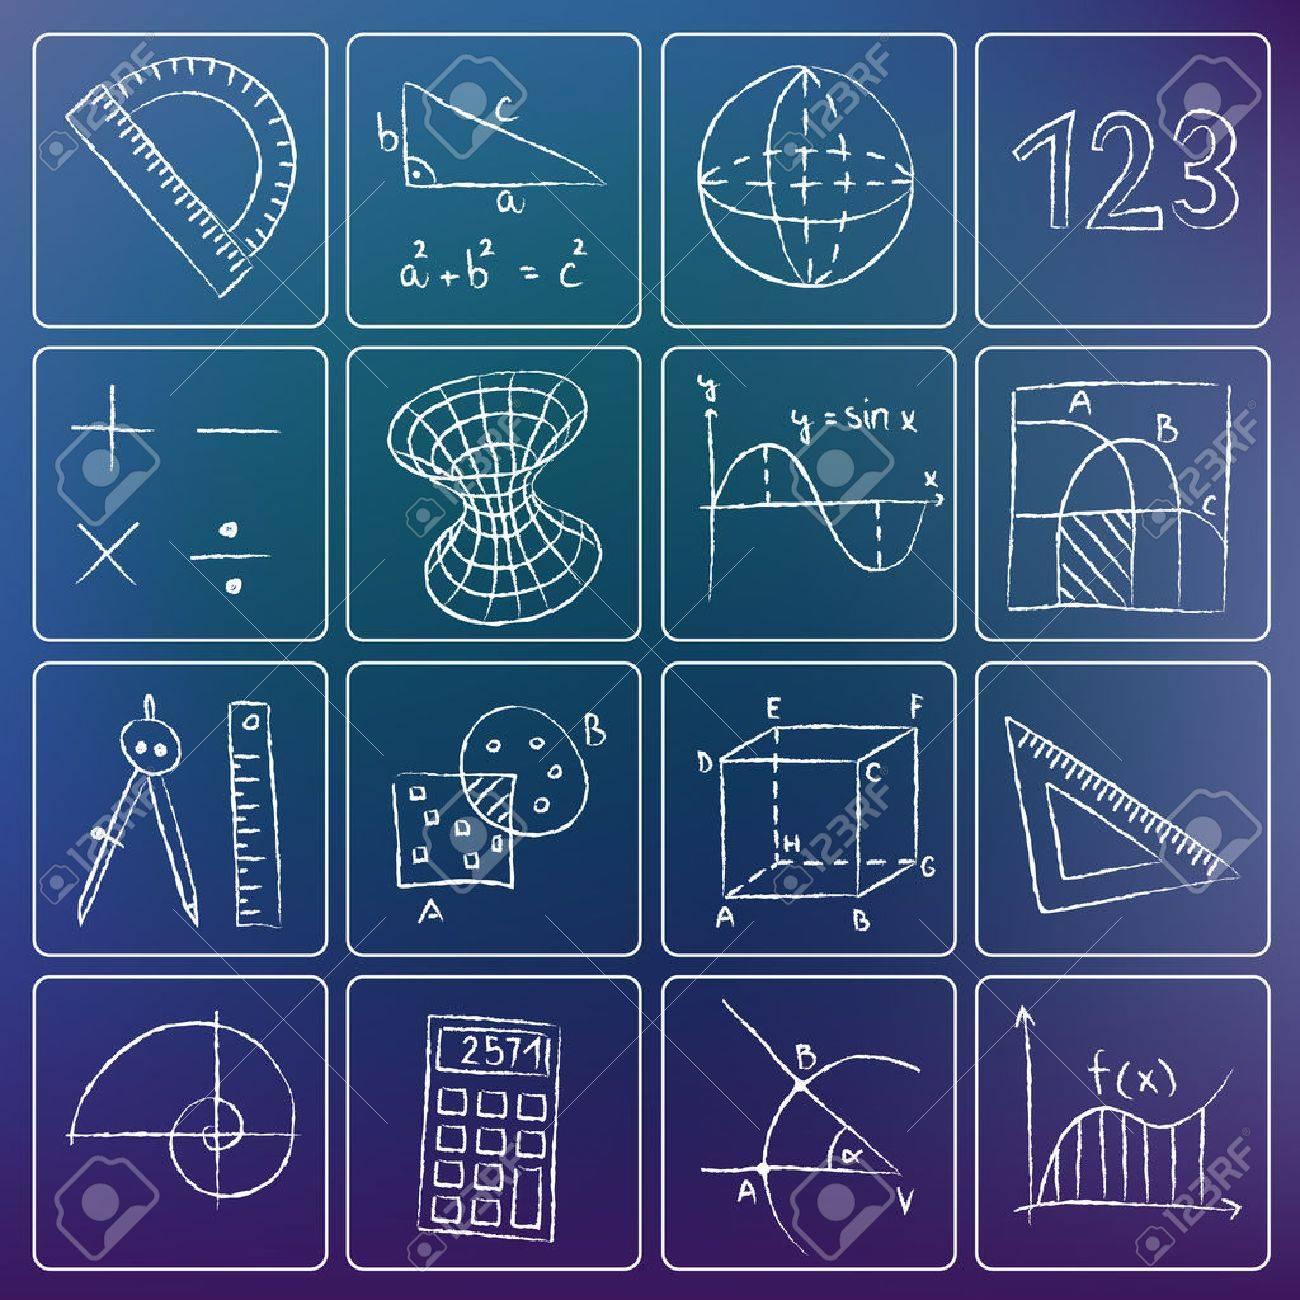 https://previews.123rf.com/images/kytalpa/kytalpa1403/kytalpa140300008/26513940-illustration-of-mathematics-icons-white-chalky-doodles.jpg